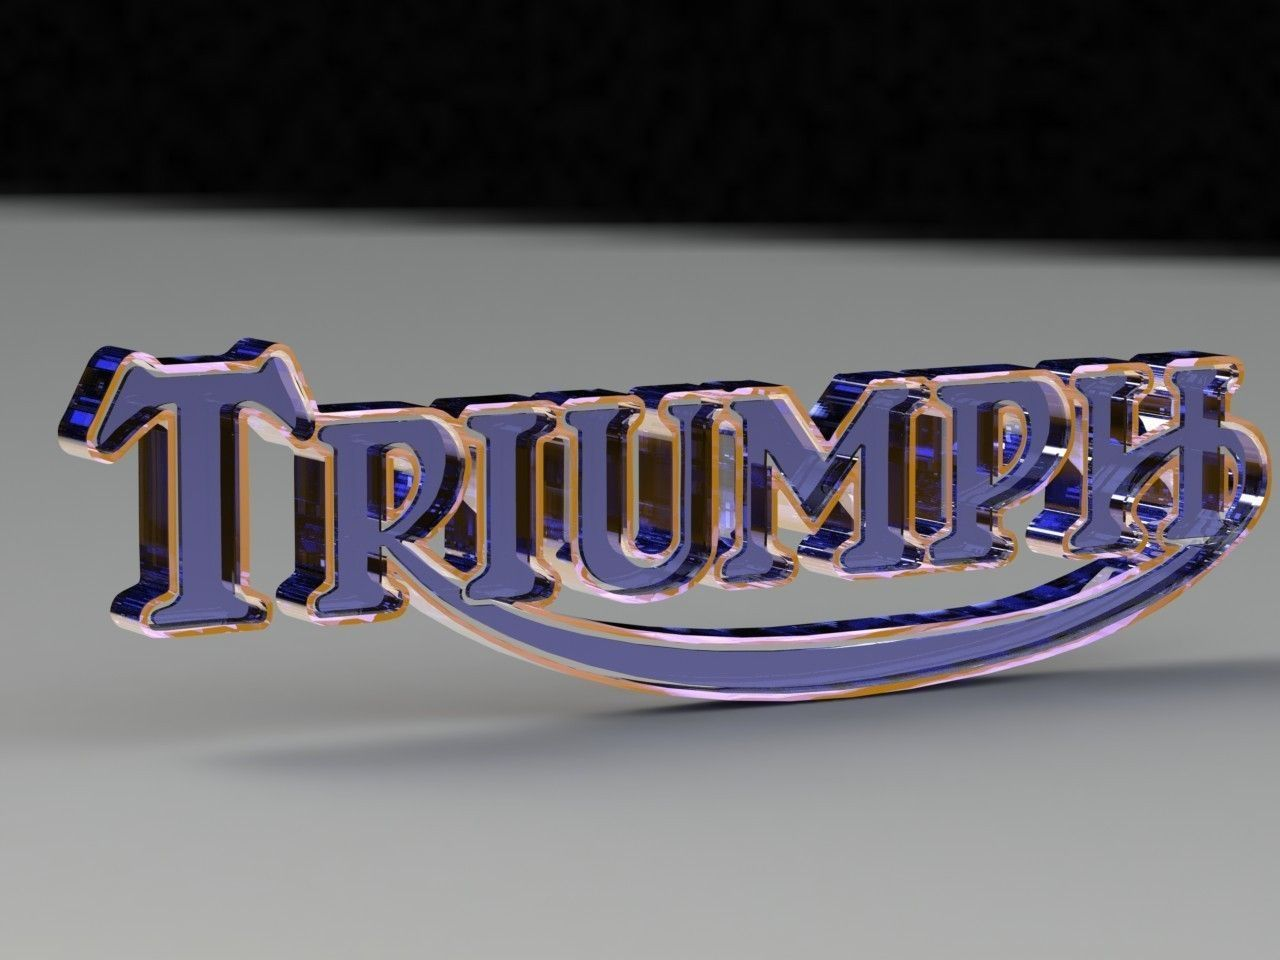 Triumph T Shirt >> 3D Triumph Logo free 3D Model 3D printable .stl .sldprt .sldasm .slddrw - CGTrader.com